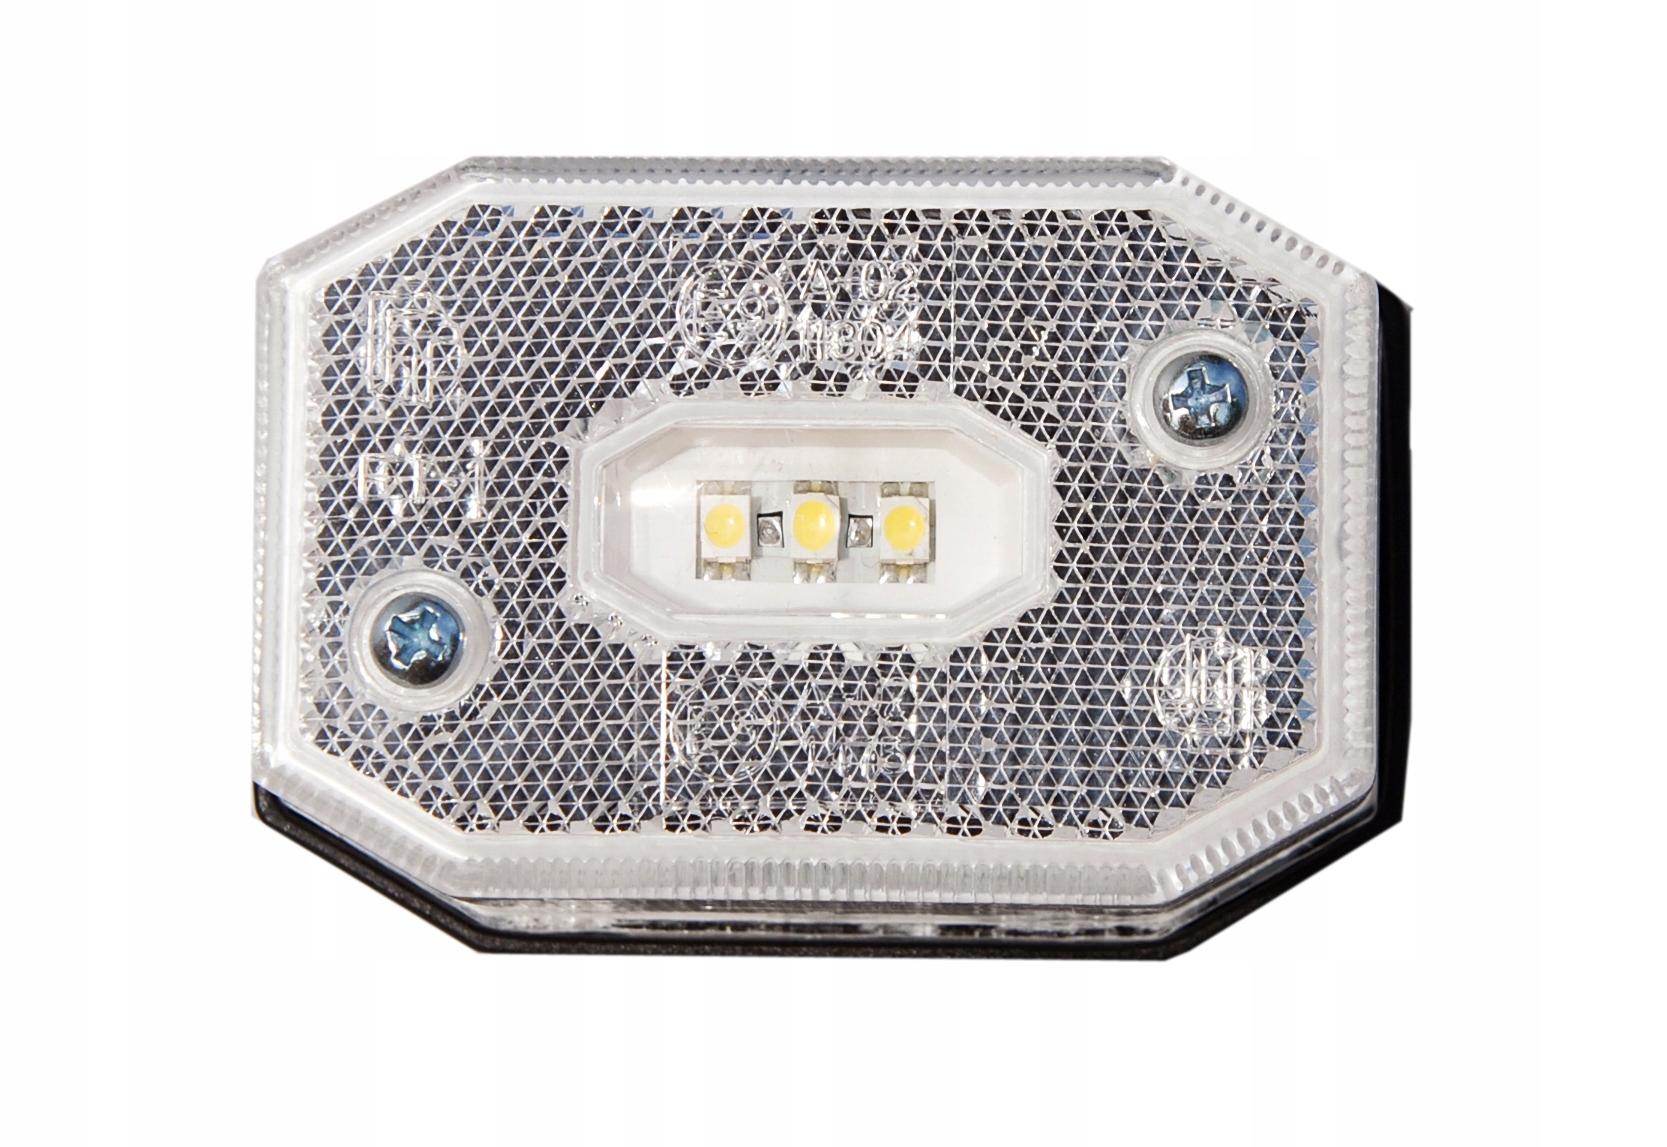 лампа габаритный мост белая led отблеск ft-001b